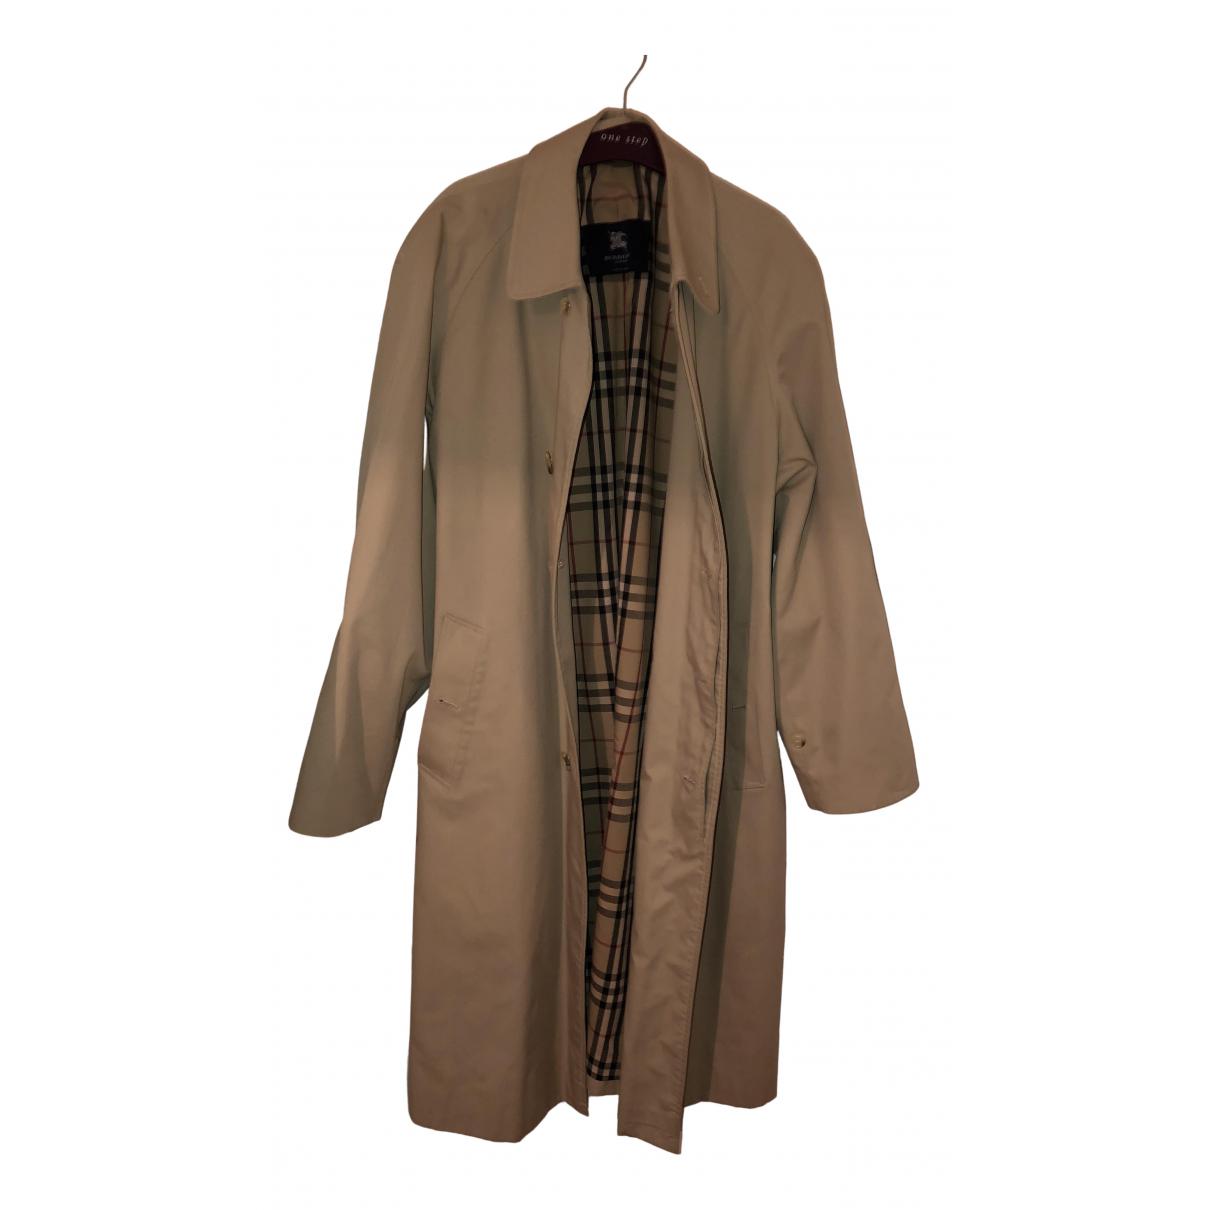 Burberry N Beige Cotton coat  for Men 48 FR